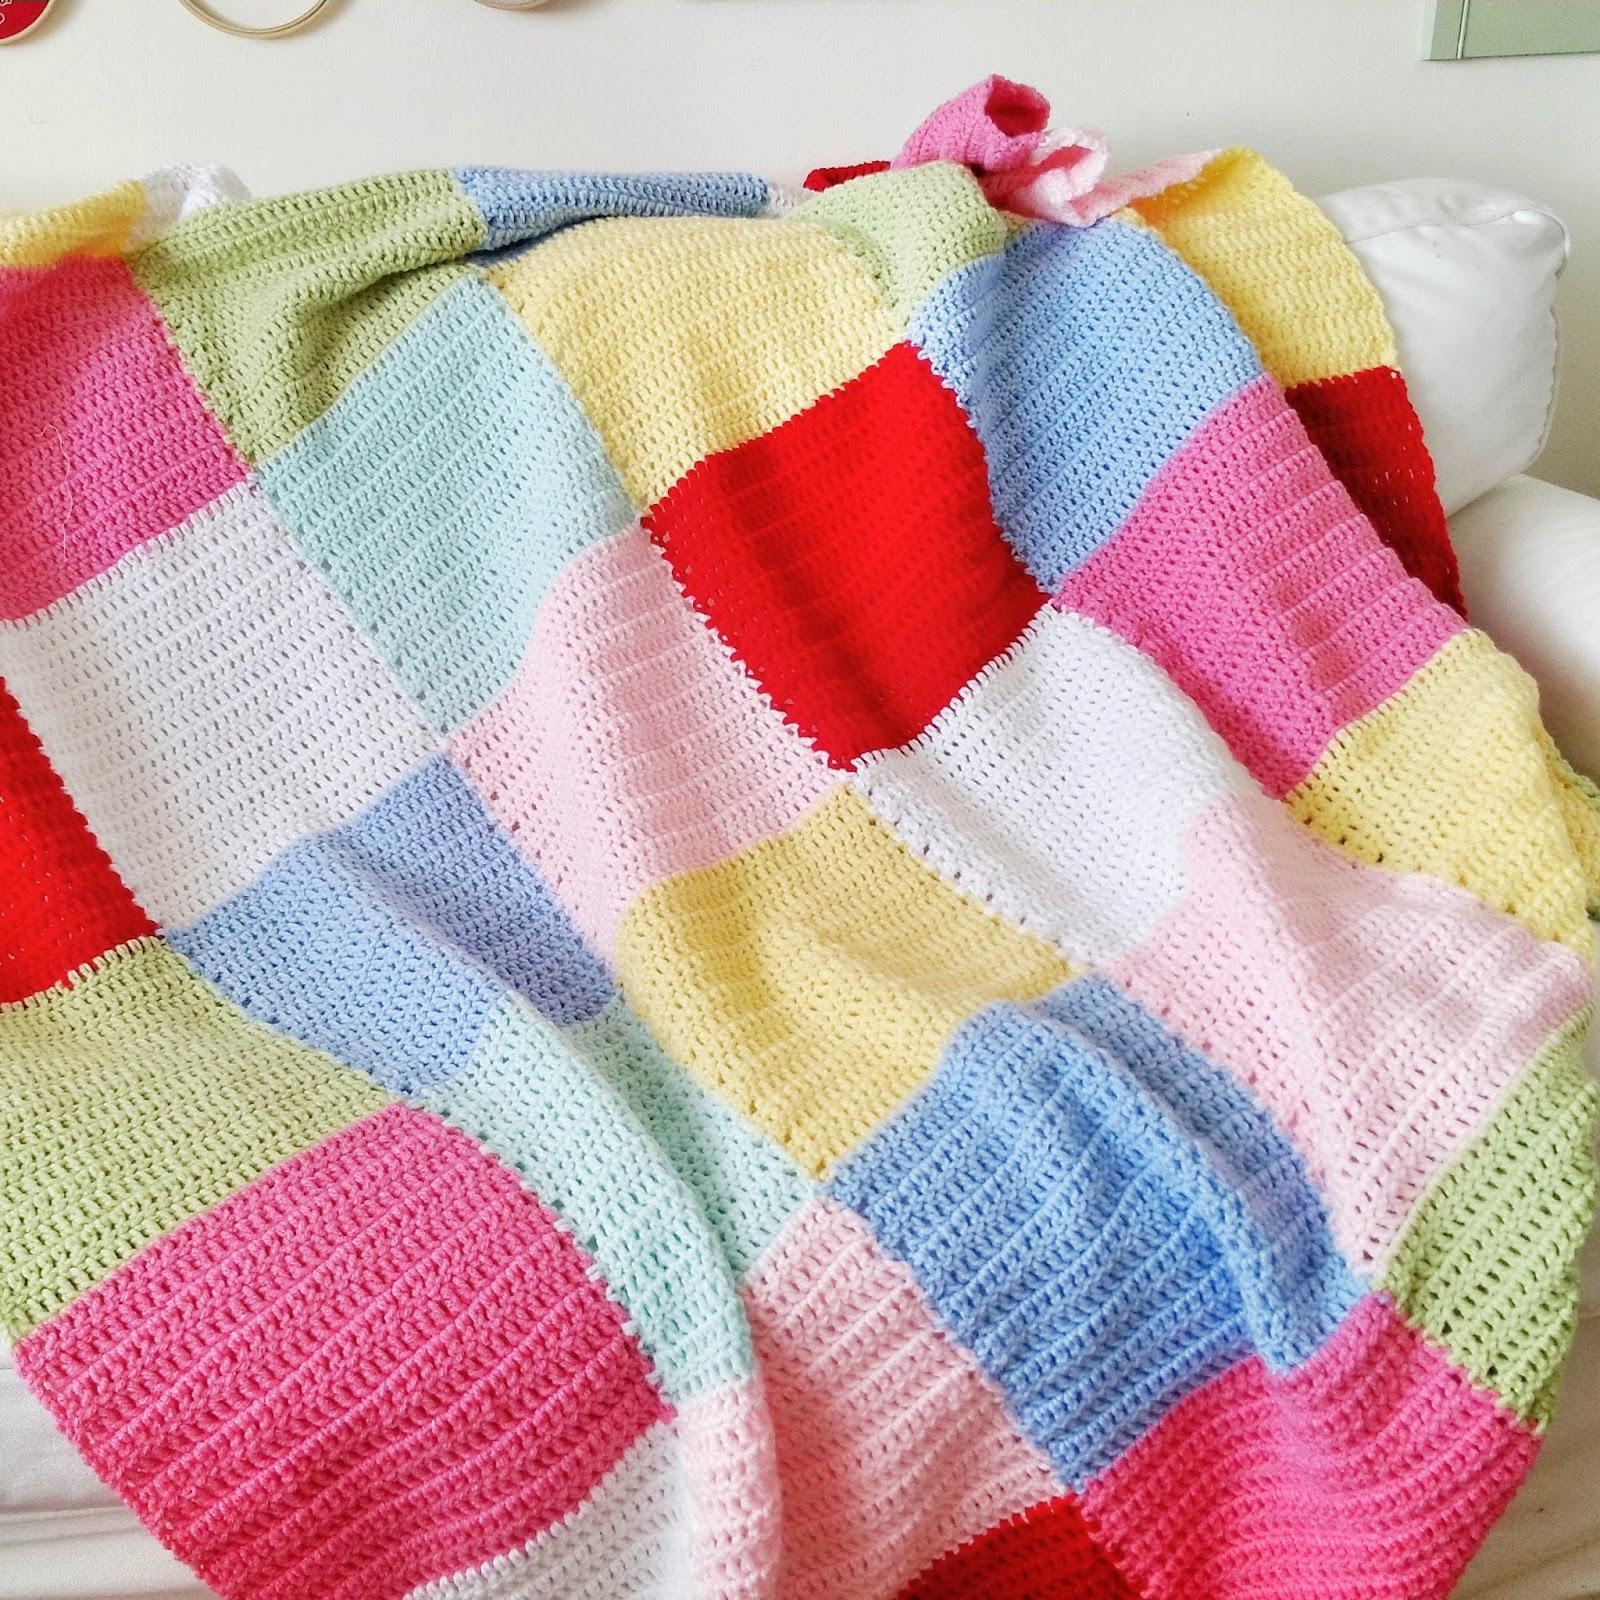 Hopscotch lane patchwork crochet blanket - Mantas de ganchillo para sofas ...